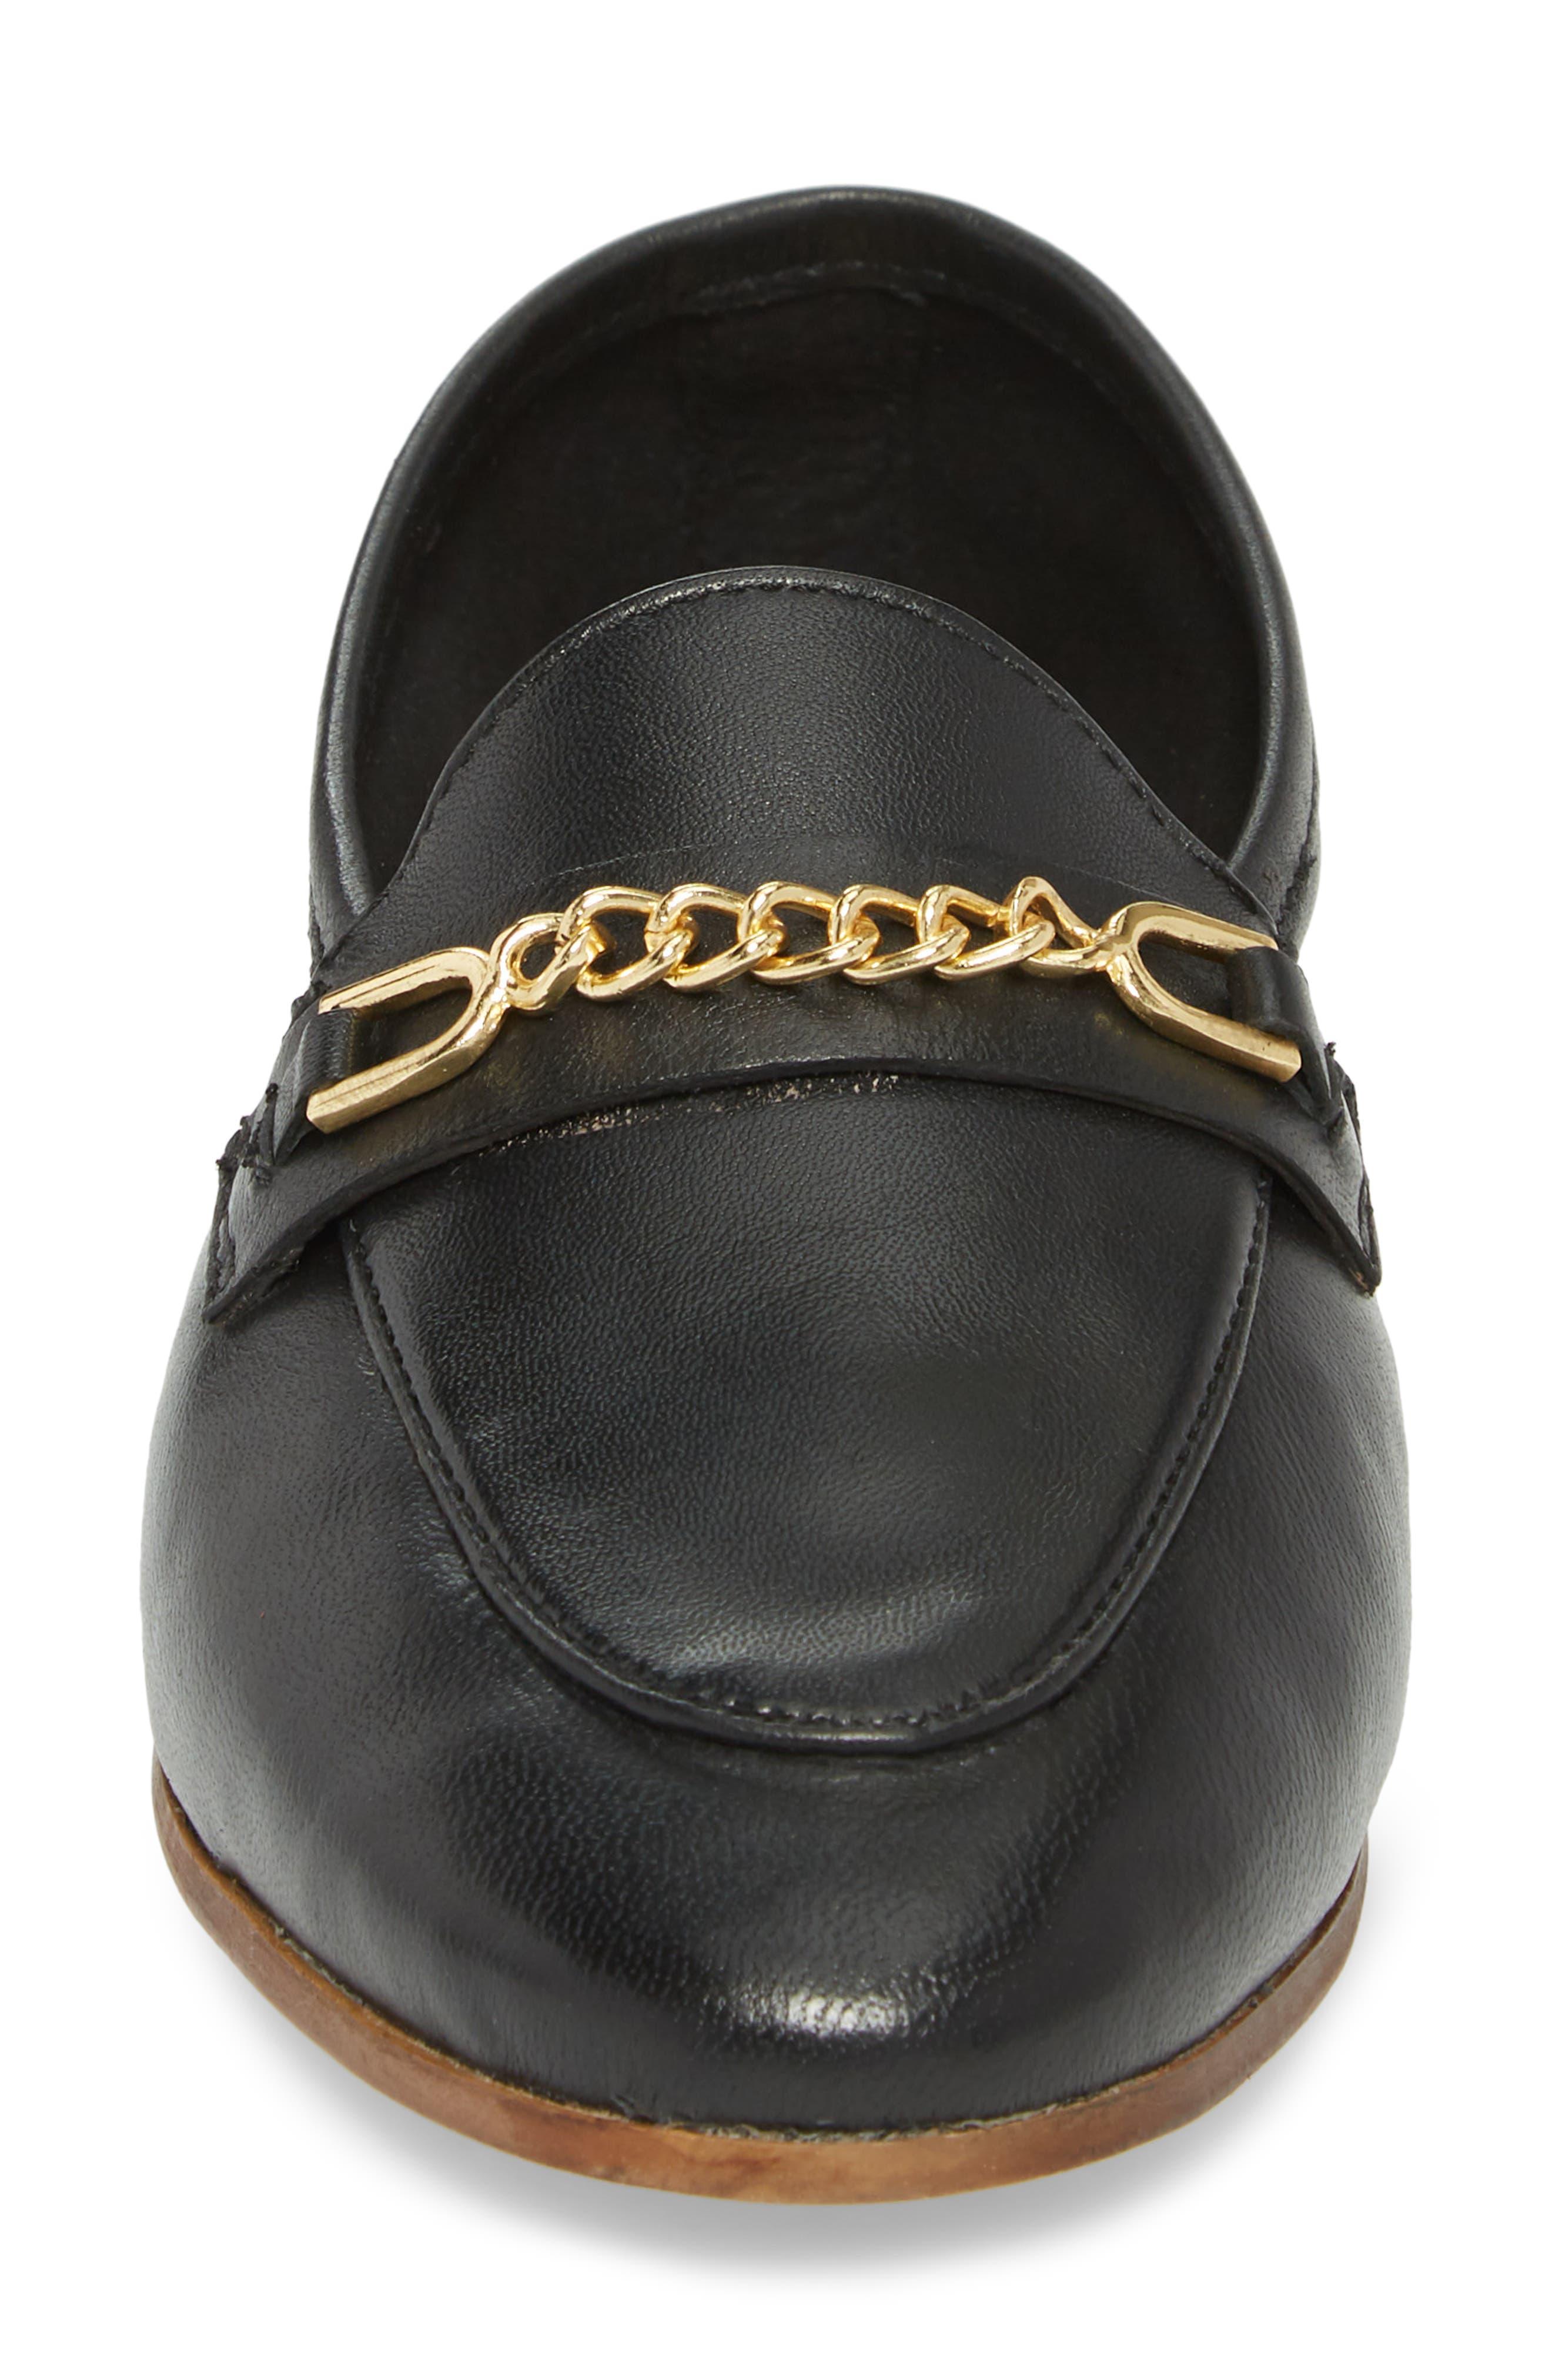 Chain Trim Apron Toe Loafer,                             Alternate thumbnail 4, color,                             Black